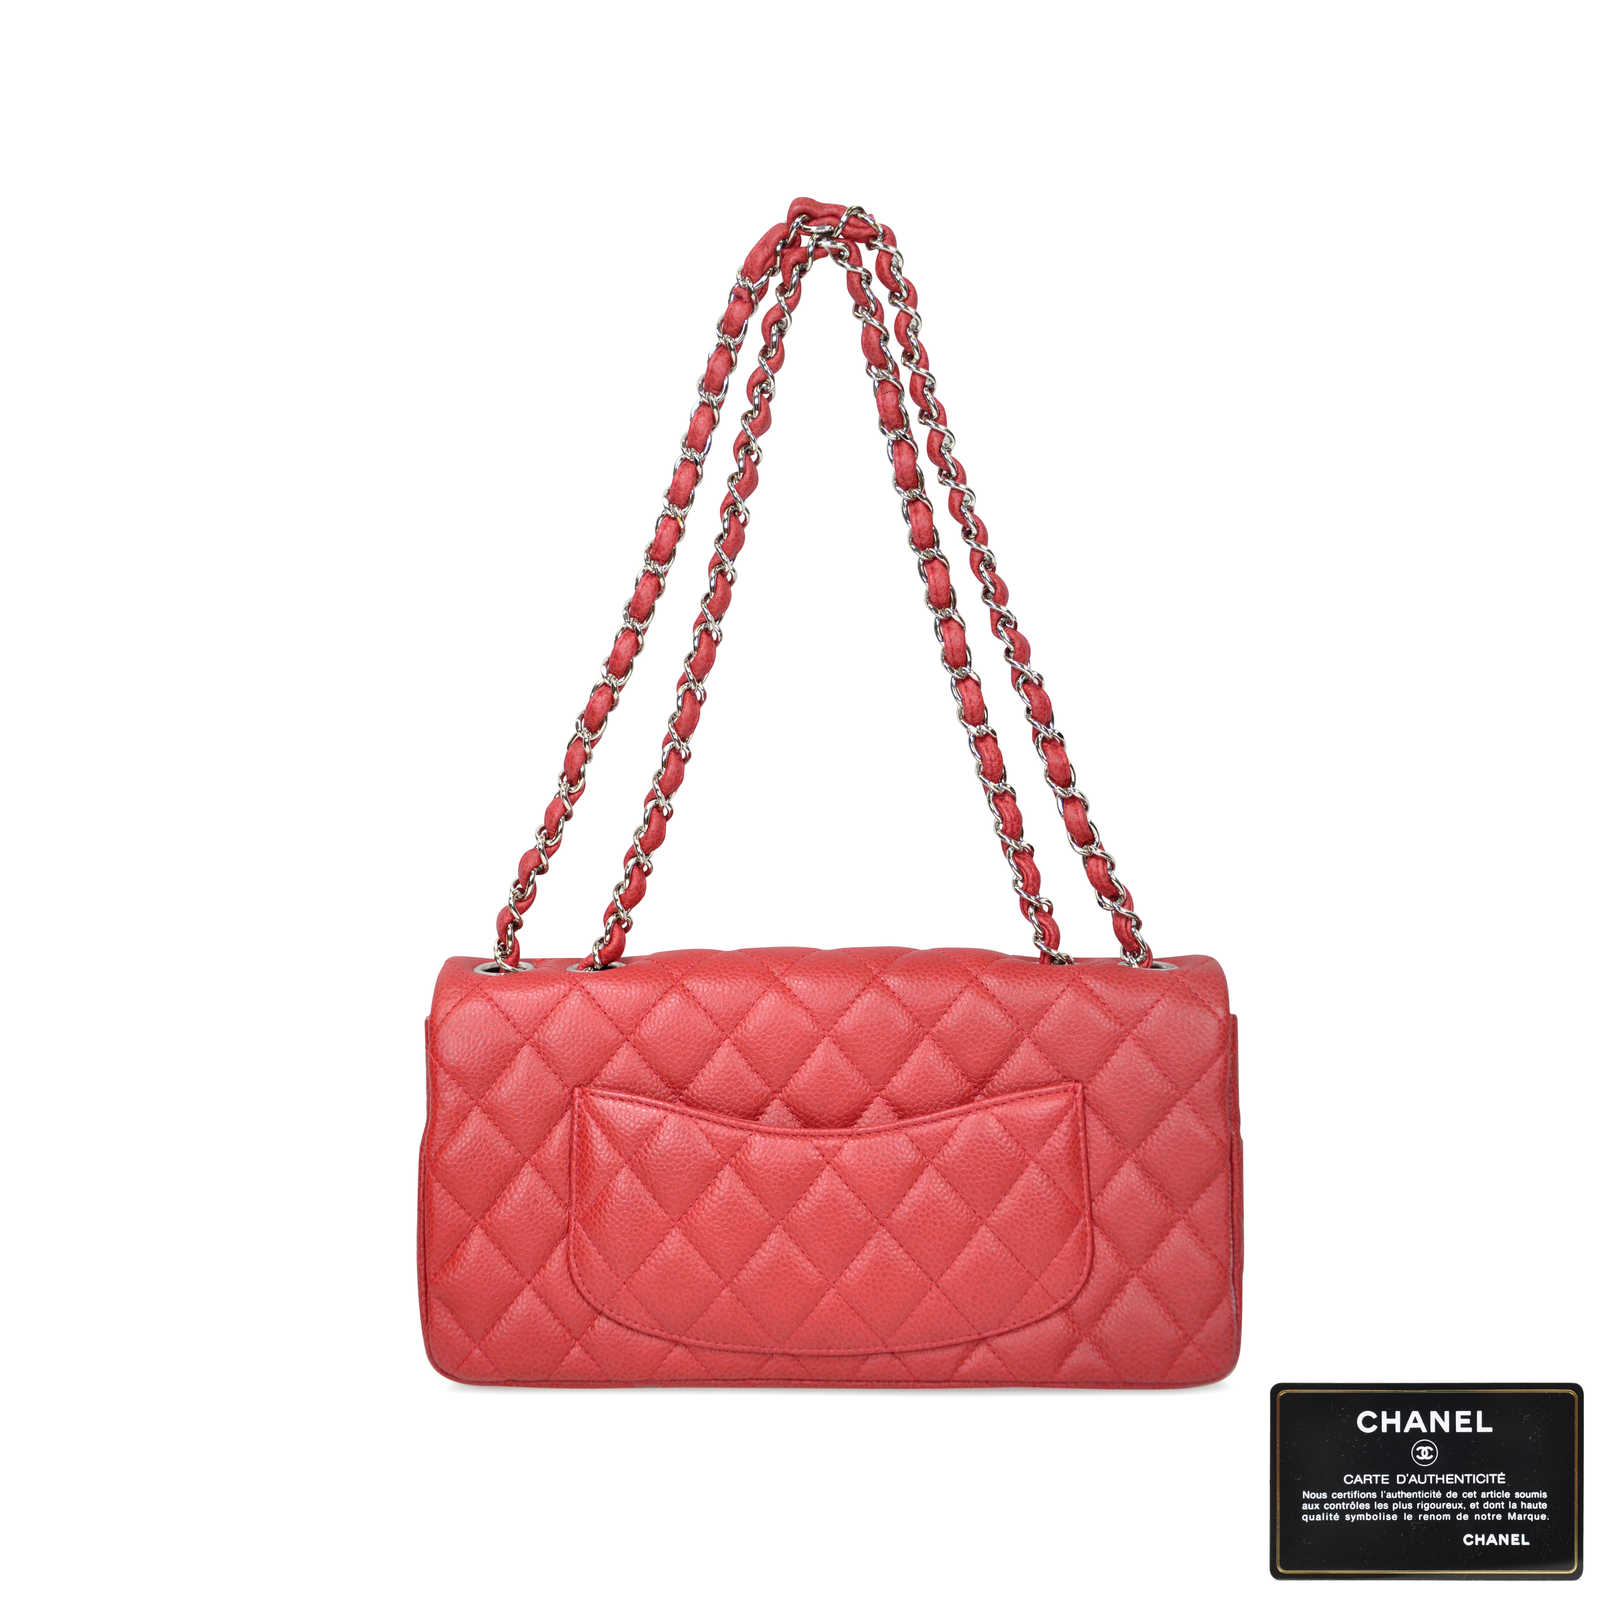 8d5338869fd434 ... Authentic Second Hand Chanel East West Flap Bag (PSS-020-00016) ...